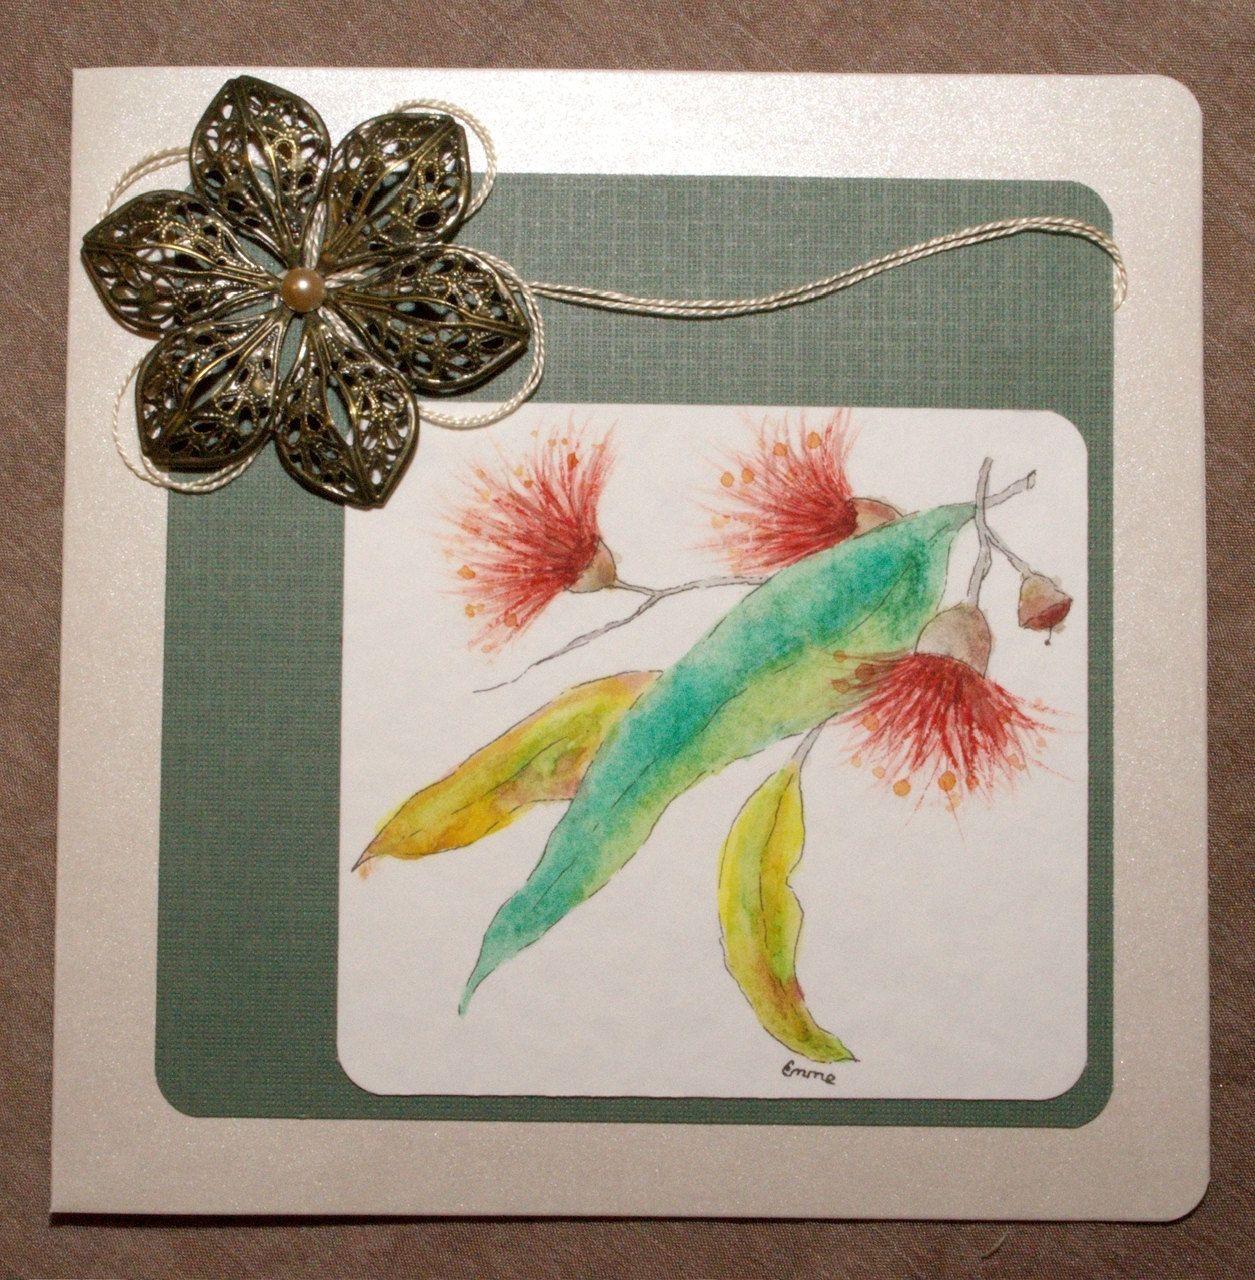 Original hand painted watercolour gum leaves & flowers Blank Greeting Card. Bronze ornate metal flower and embroidery thread. OOAK.